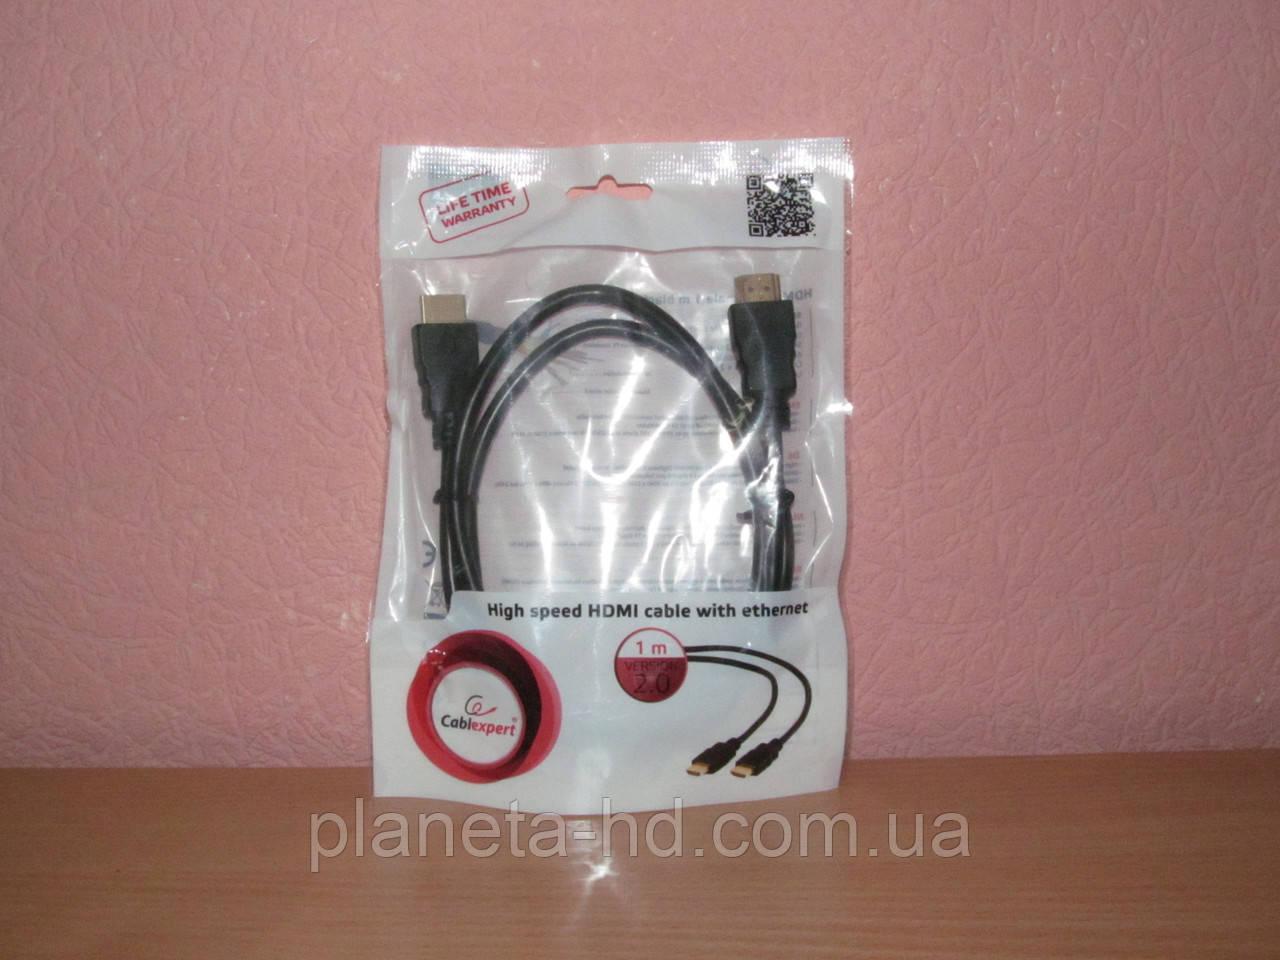 Кабель HDMI to HDMI 1.0m Cablexpert (CC-HDMI4-1M) HDMI (Type A), HDMI (Type A), 1 м